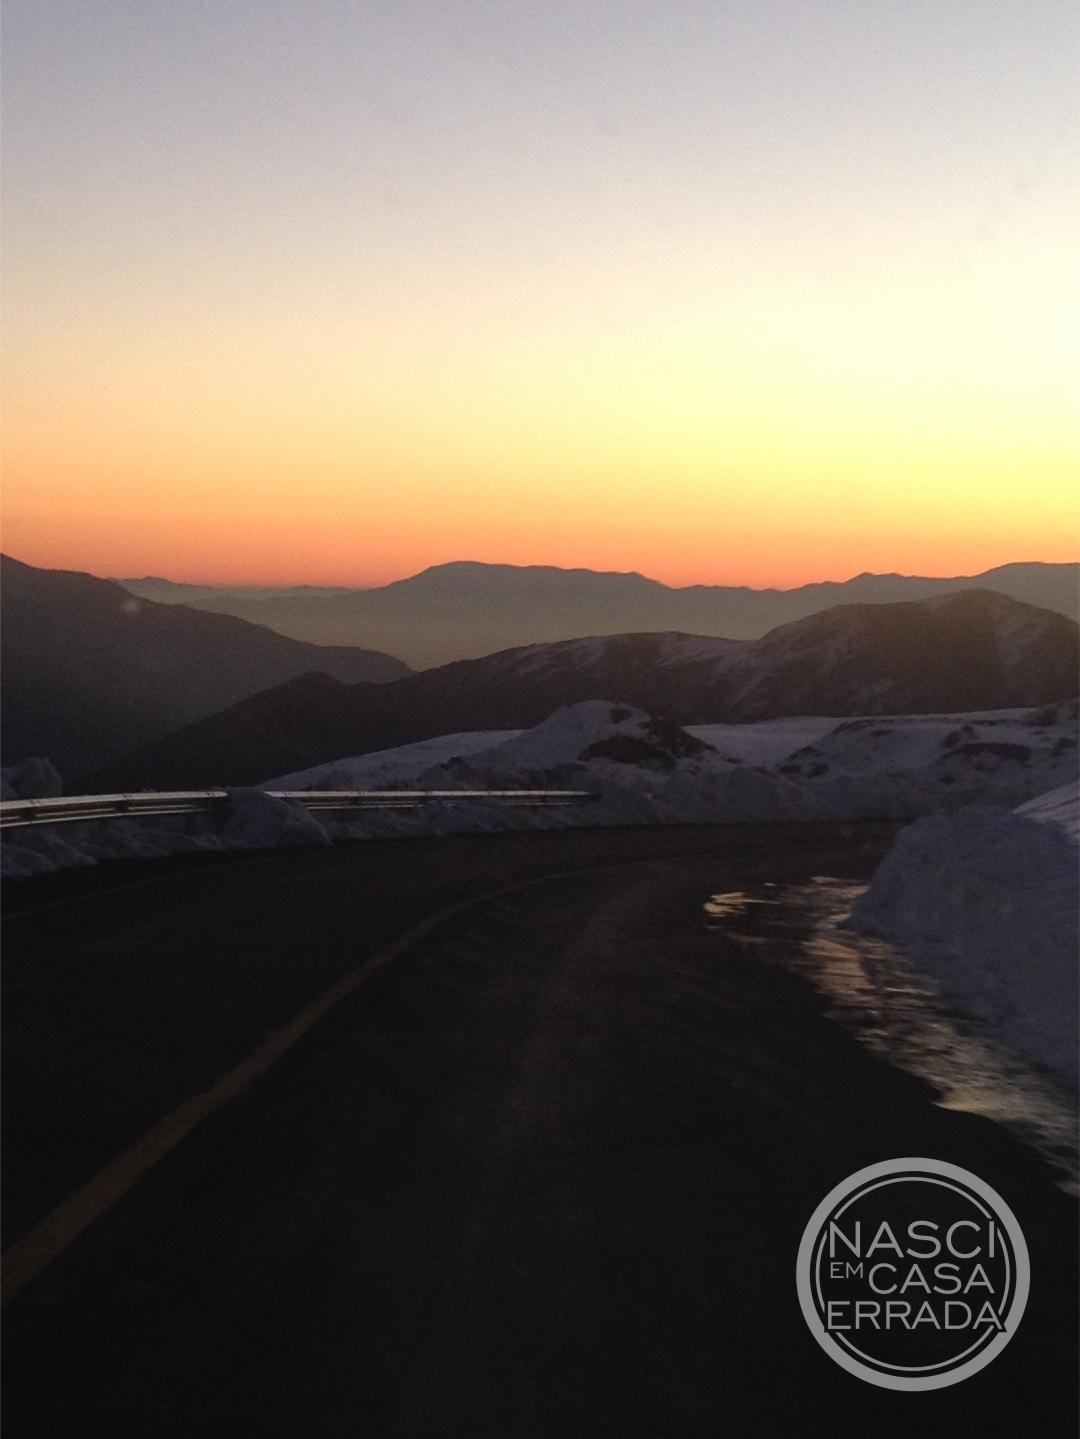 valle nevado___________________